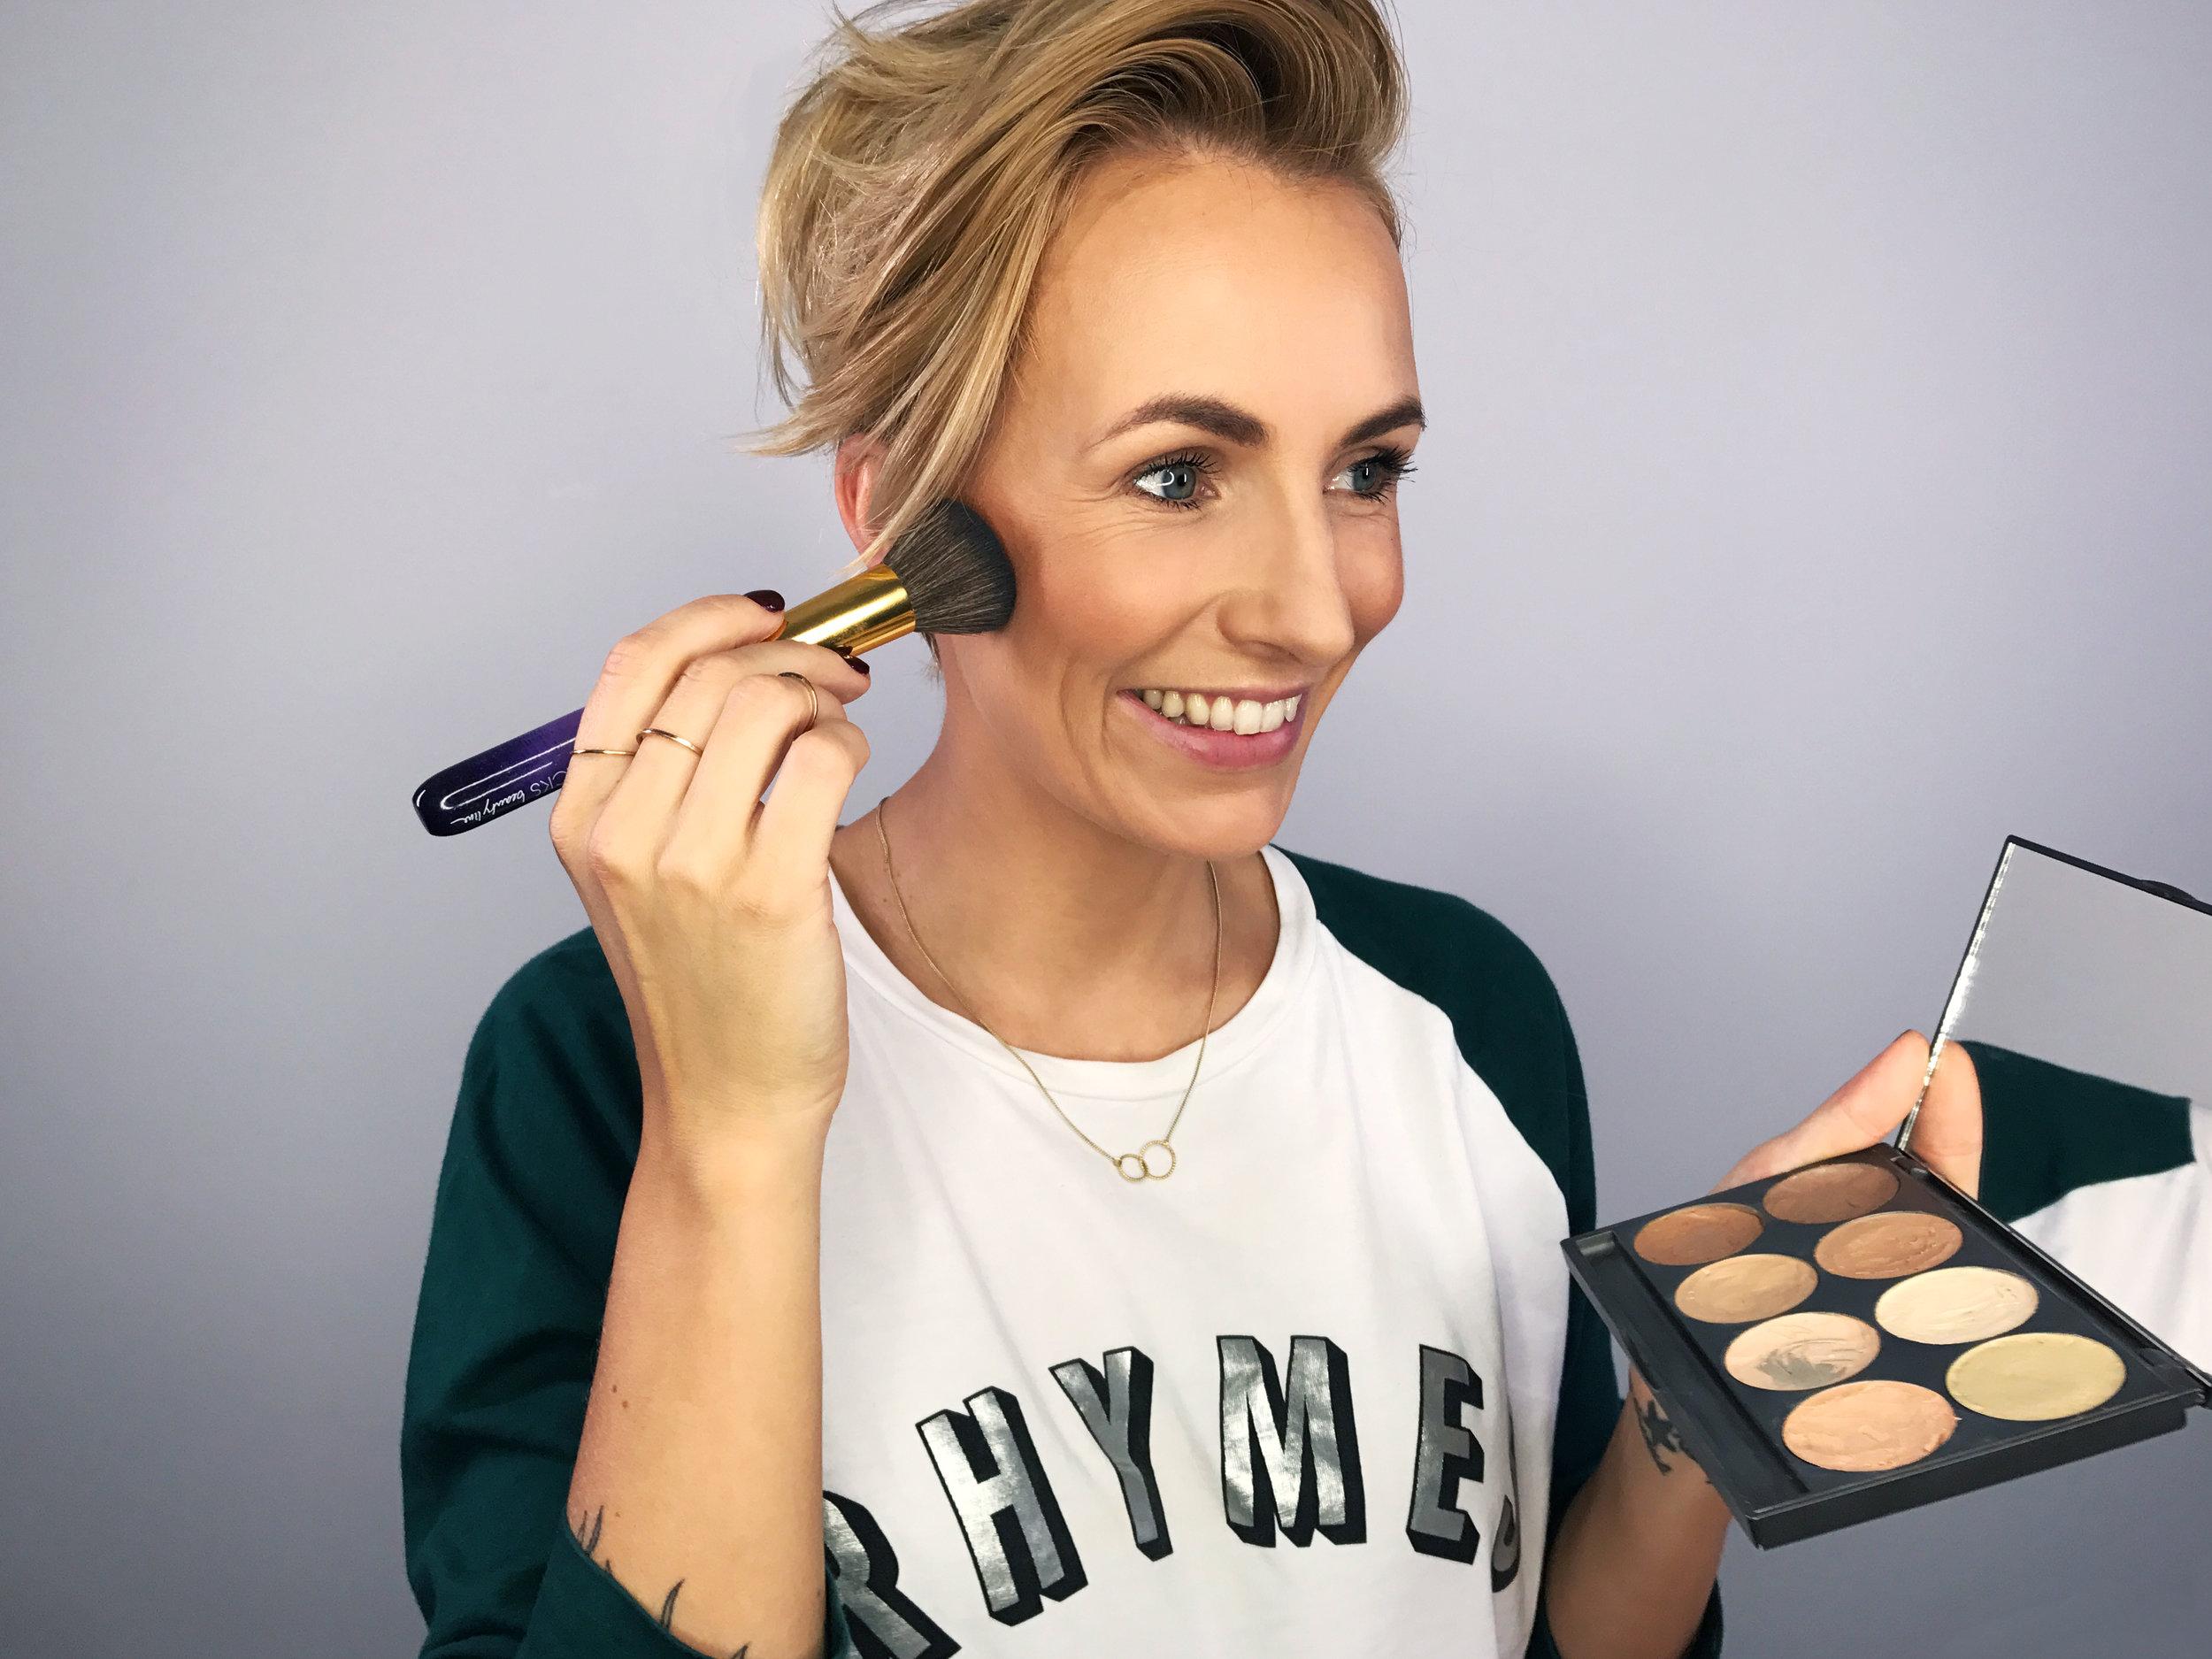 Miria_Jacks_beauty_line_Makeup_Designory_Foundation